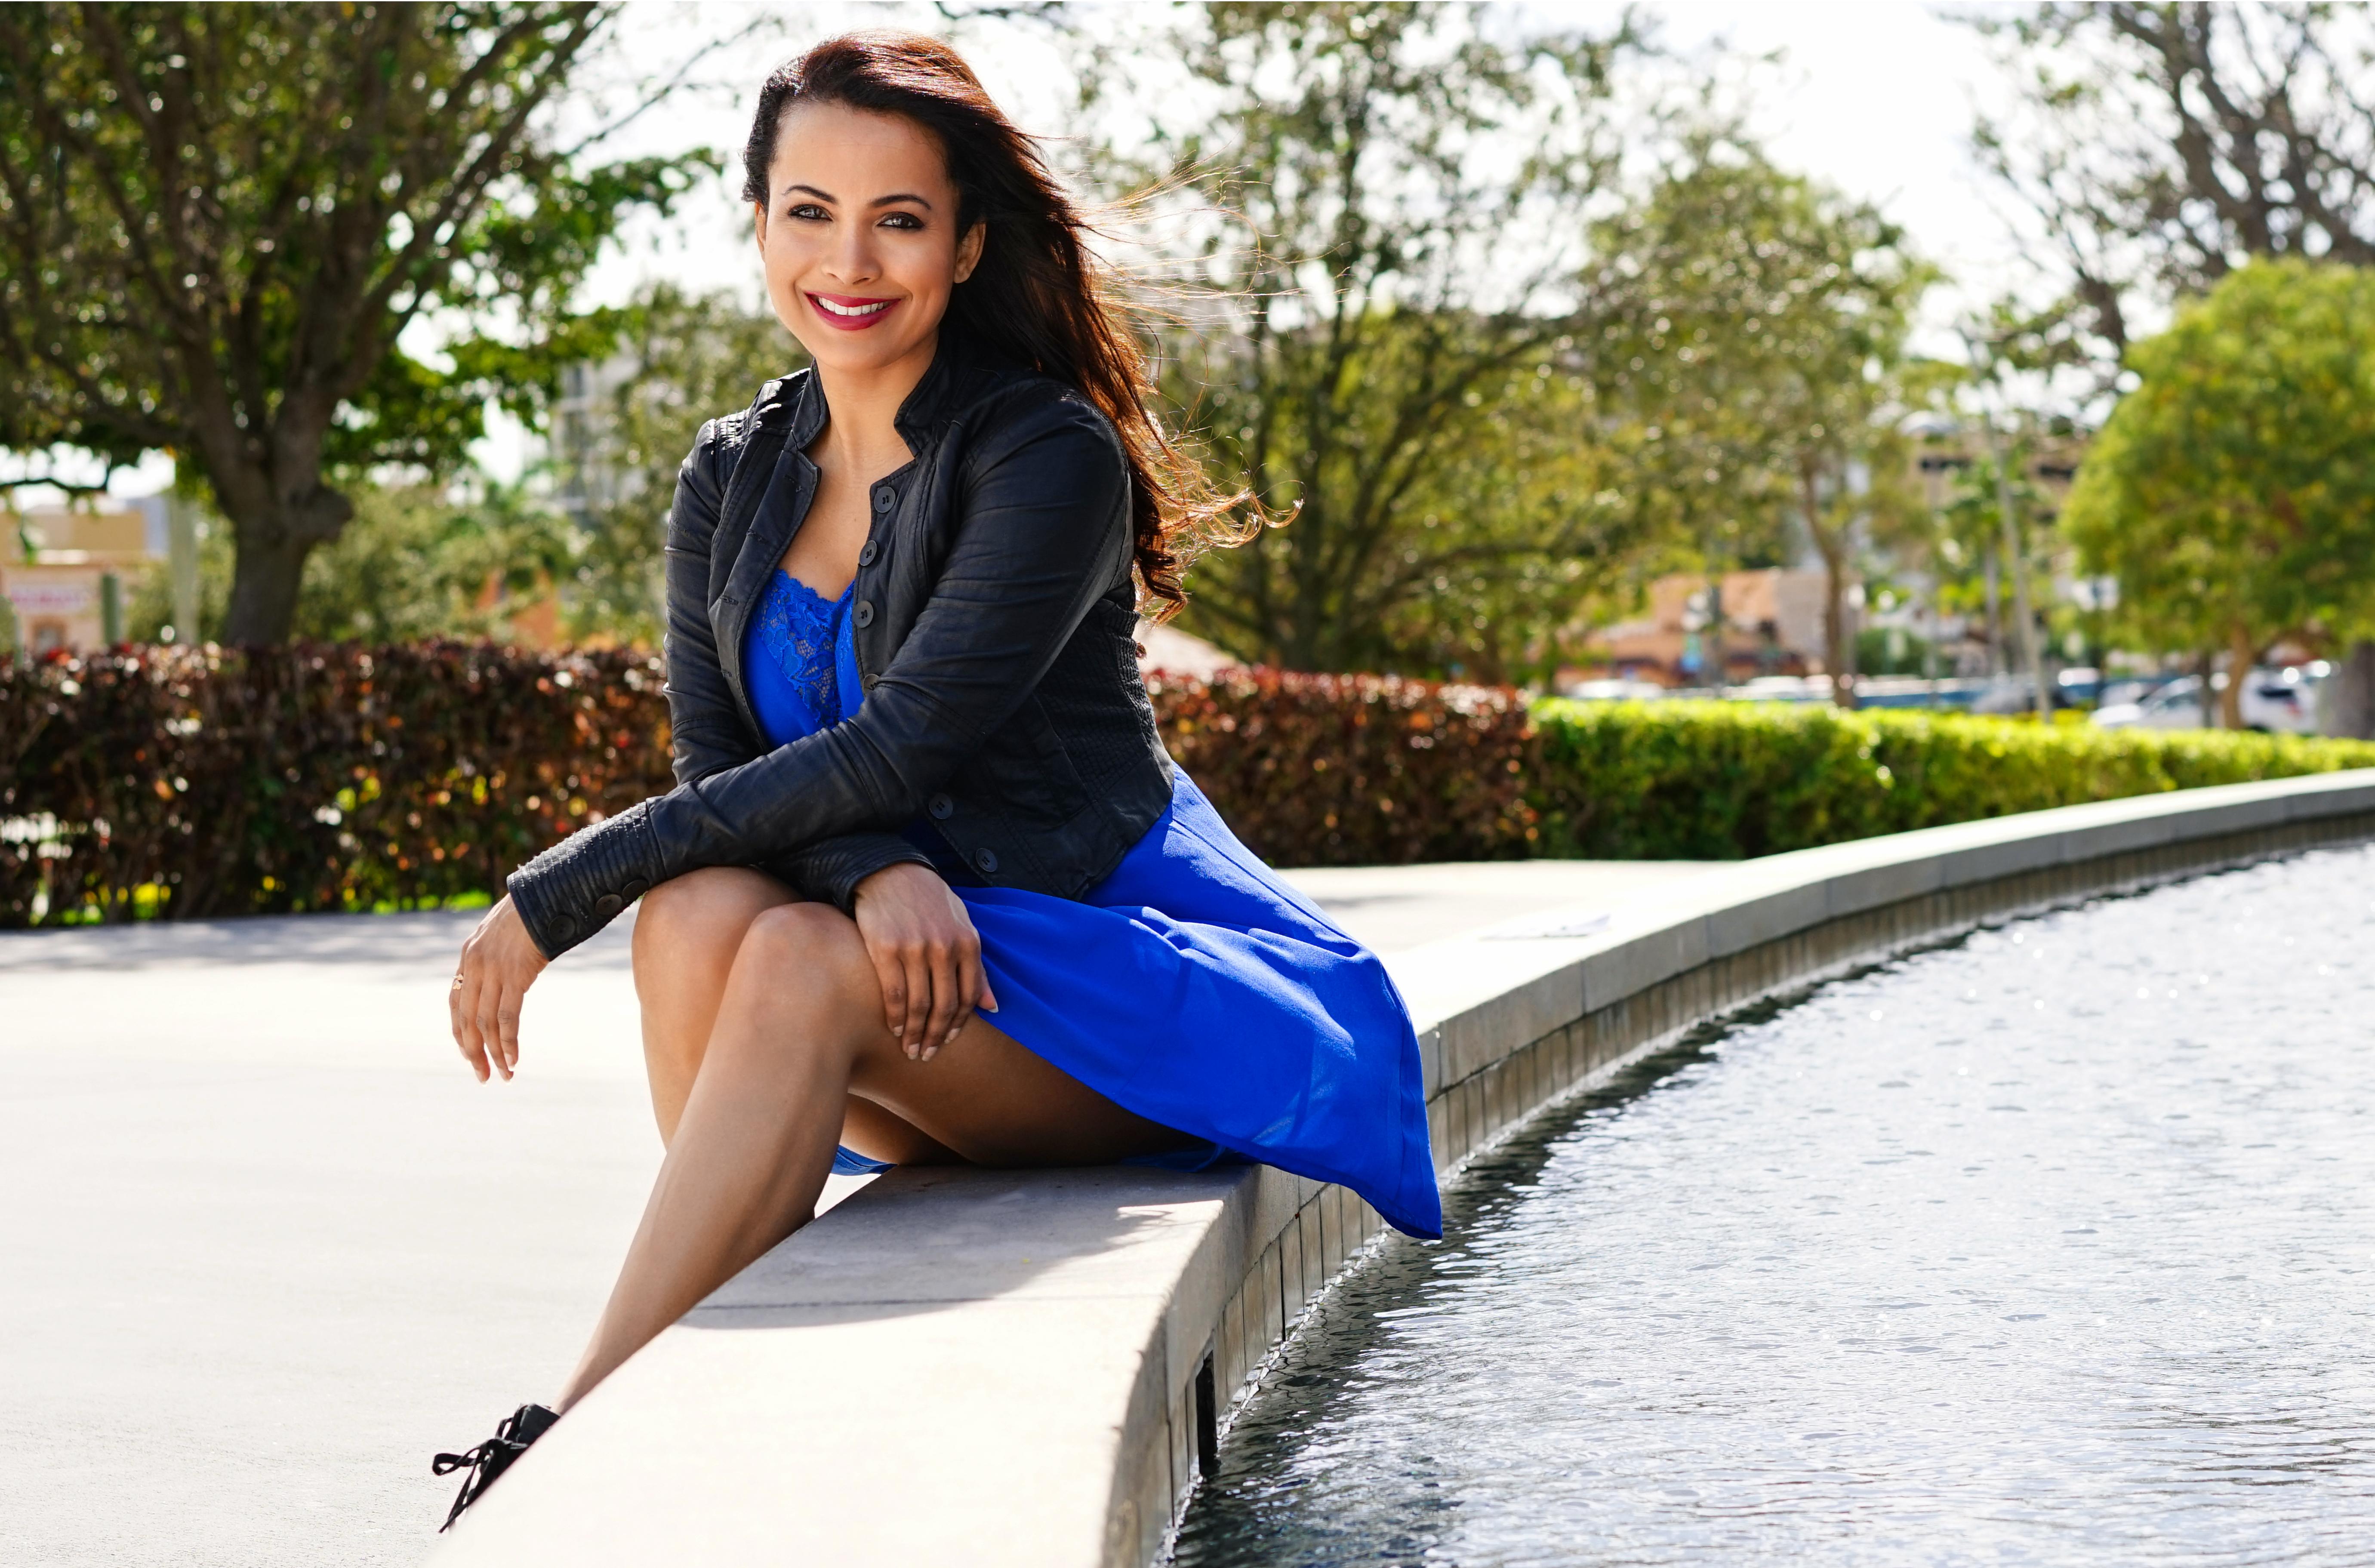 Model | Jacqueline Sanabia